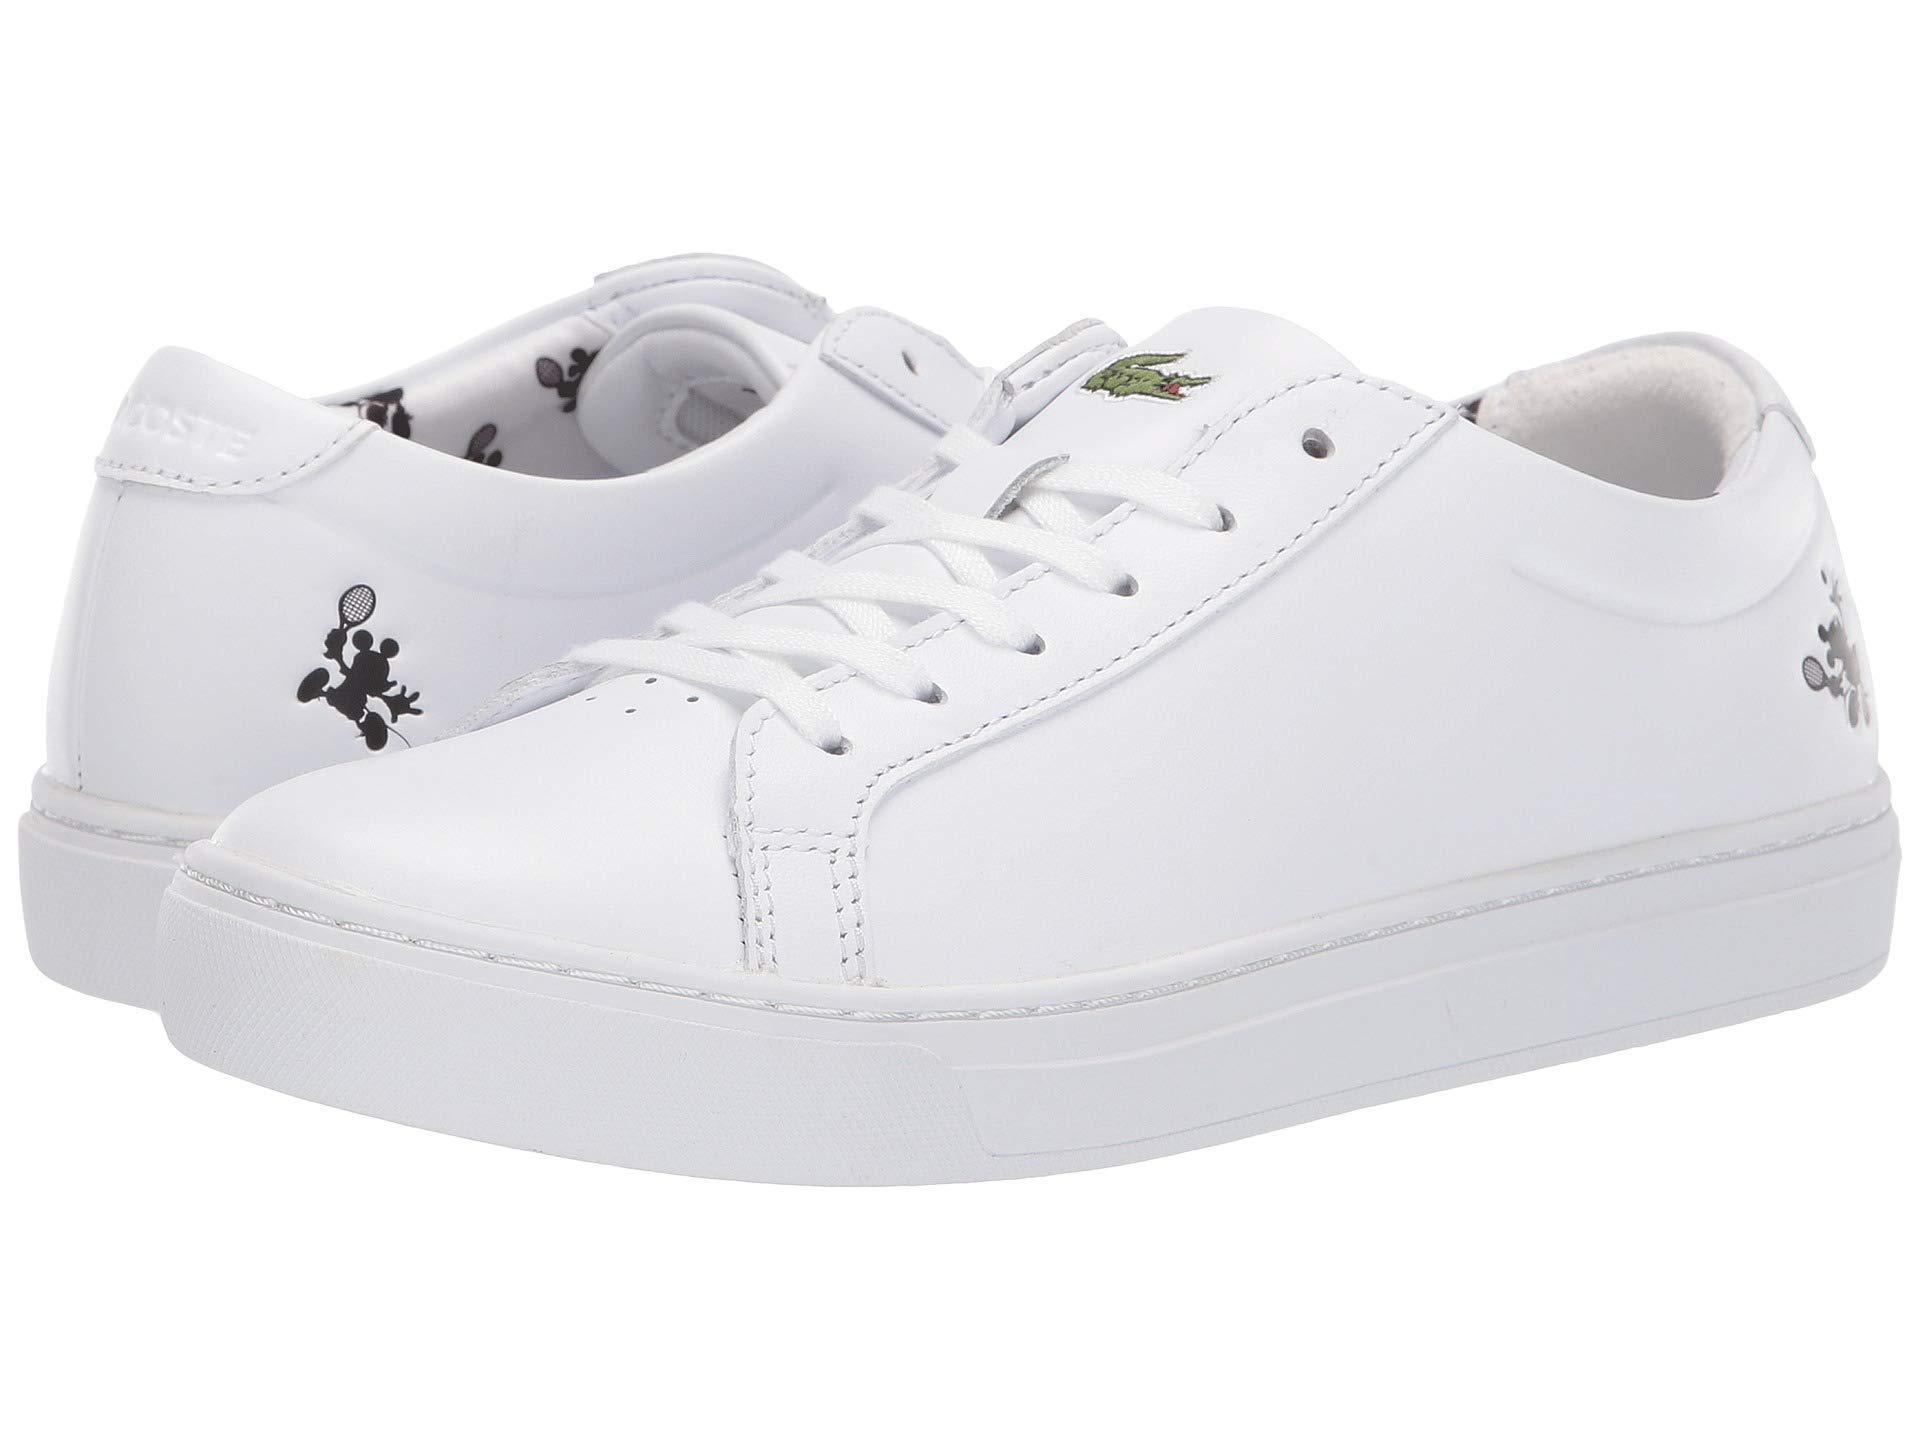 9c34075bd745 Lyst - Lacoste L.12.12 418 1 Disney (white) Women s Shoes in White